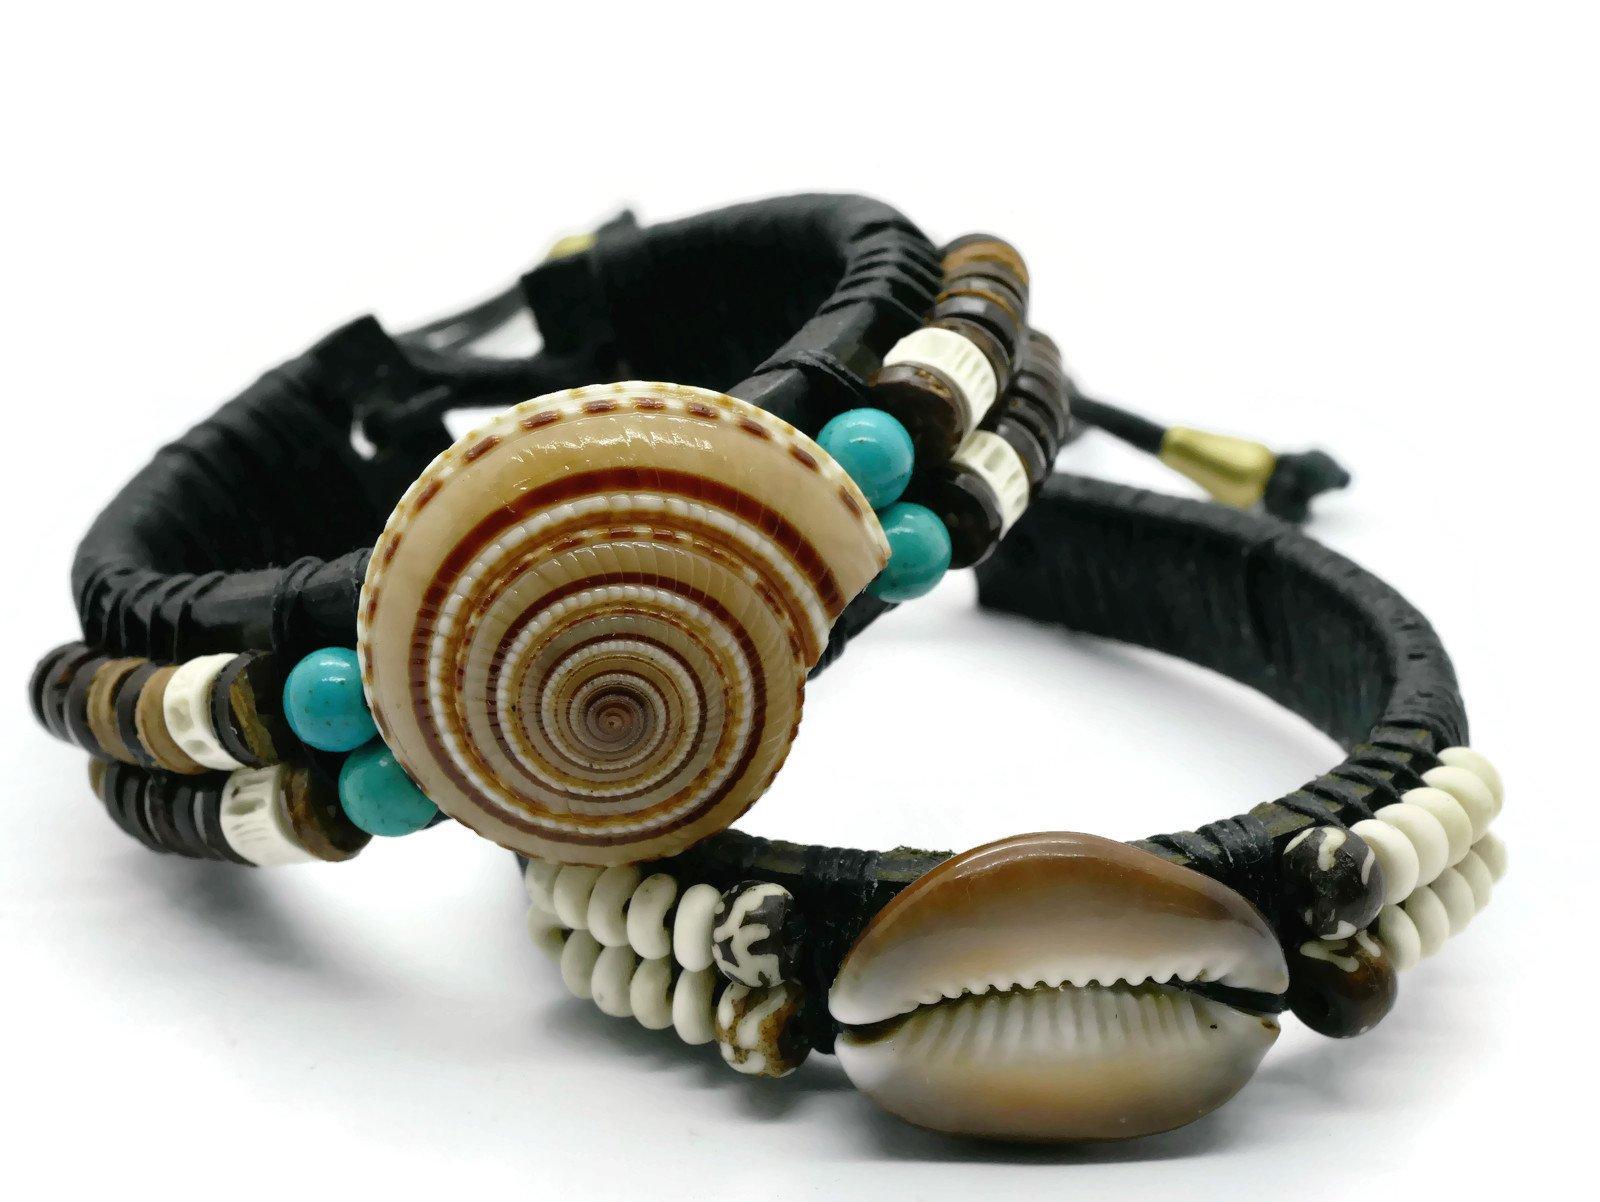 BrownBeans, Set of 2, Tribal Summer Hawaiian Style Seashell Beads Leather Women Slide Knot Adjust Bracelet (CBCT8003) (A01)